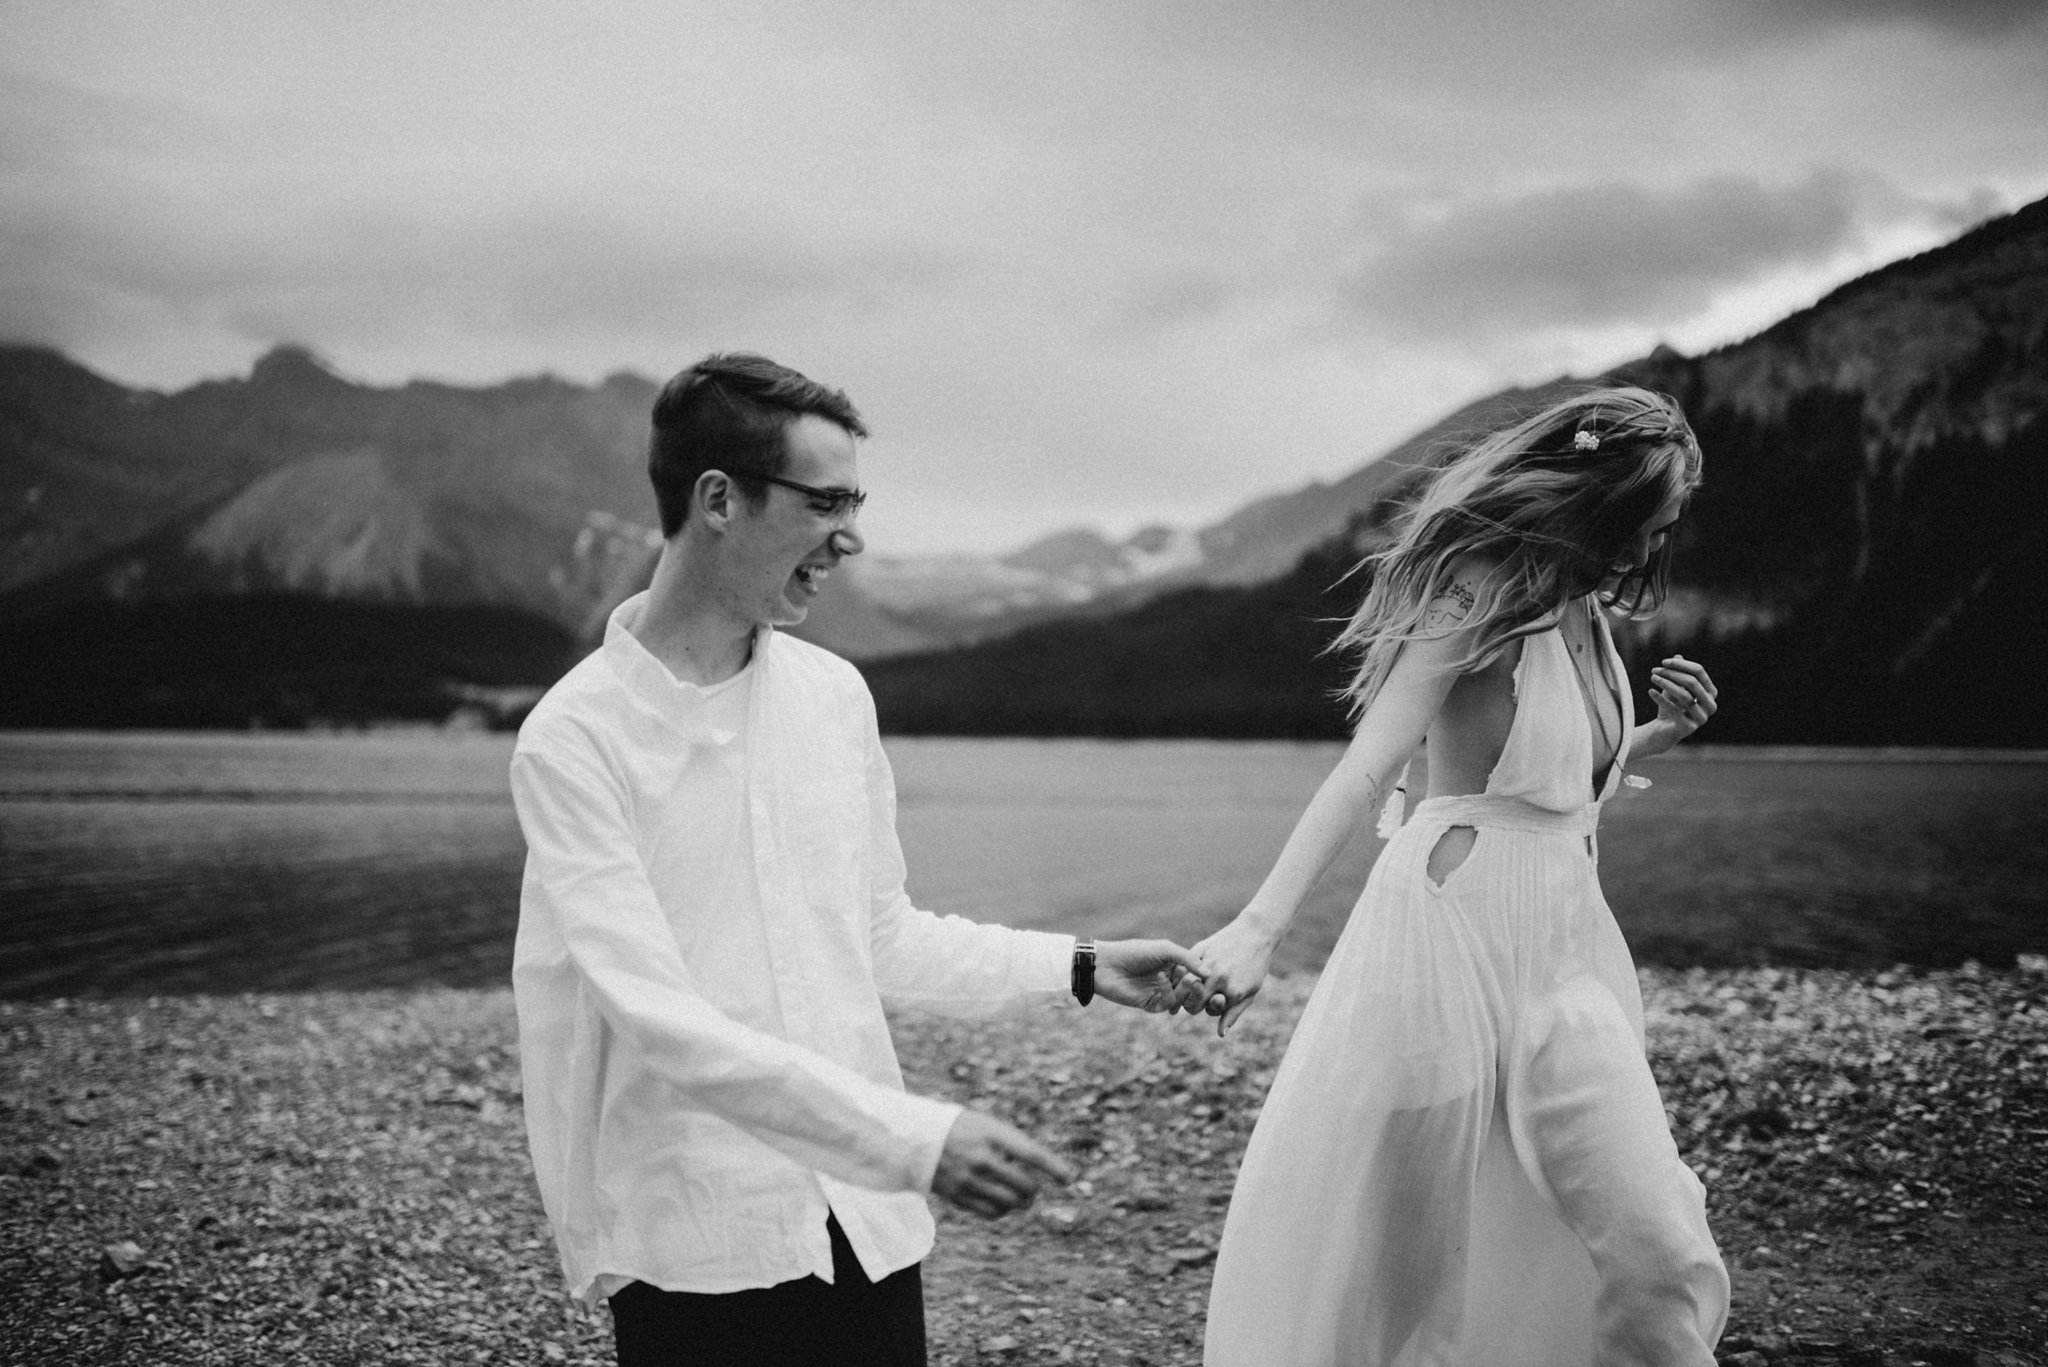 kaihla_tonai_intimate_wedding_elopement_photographer_6442.jpg